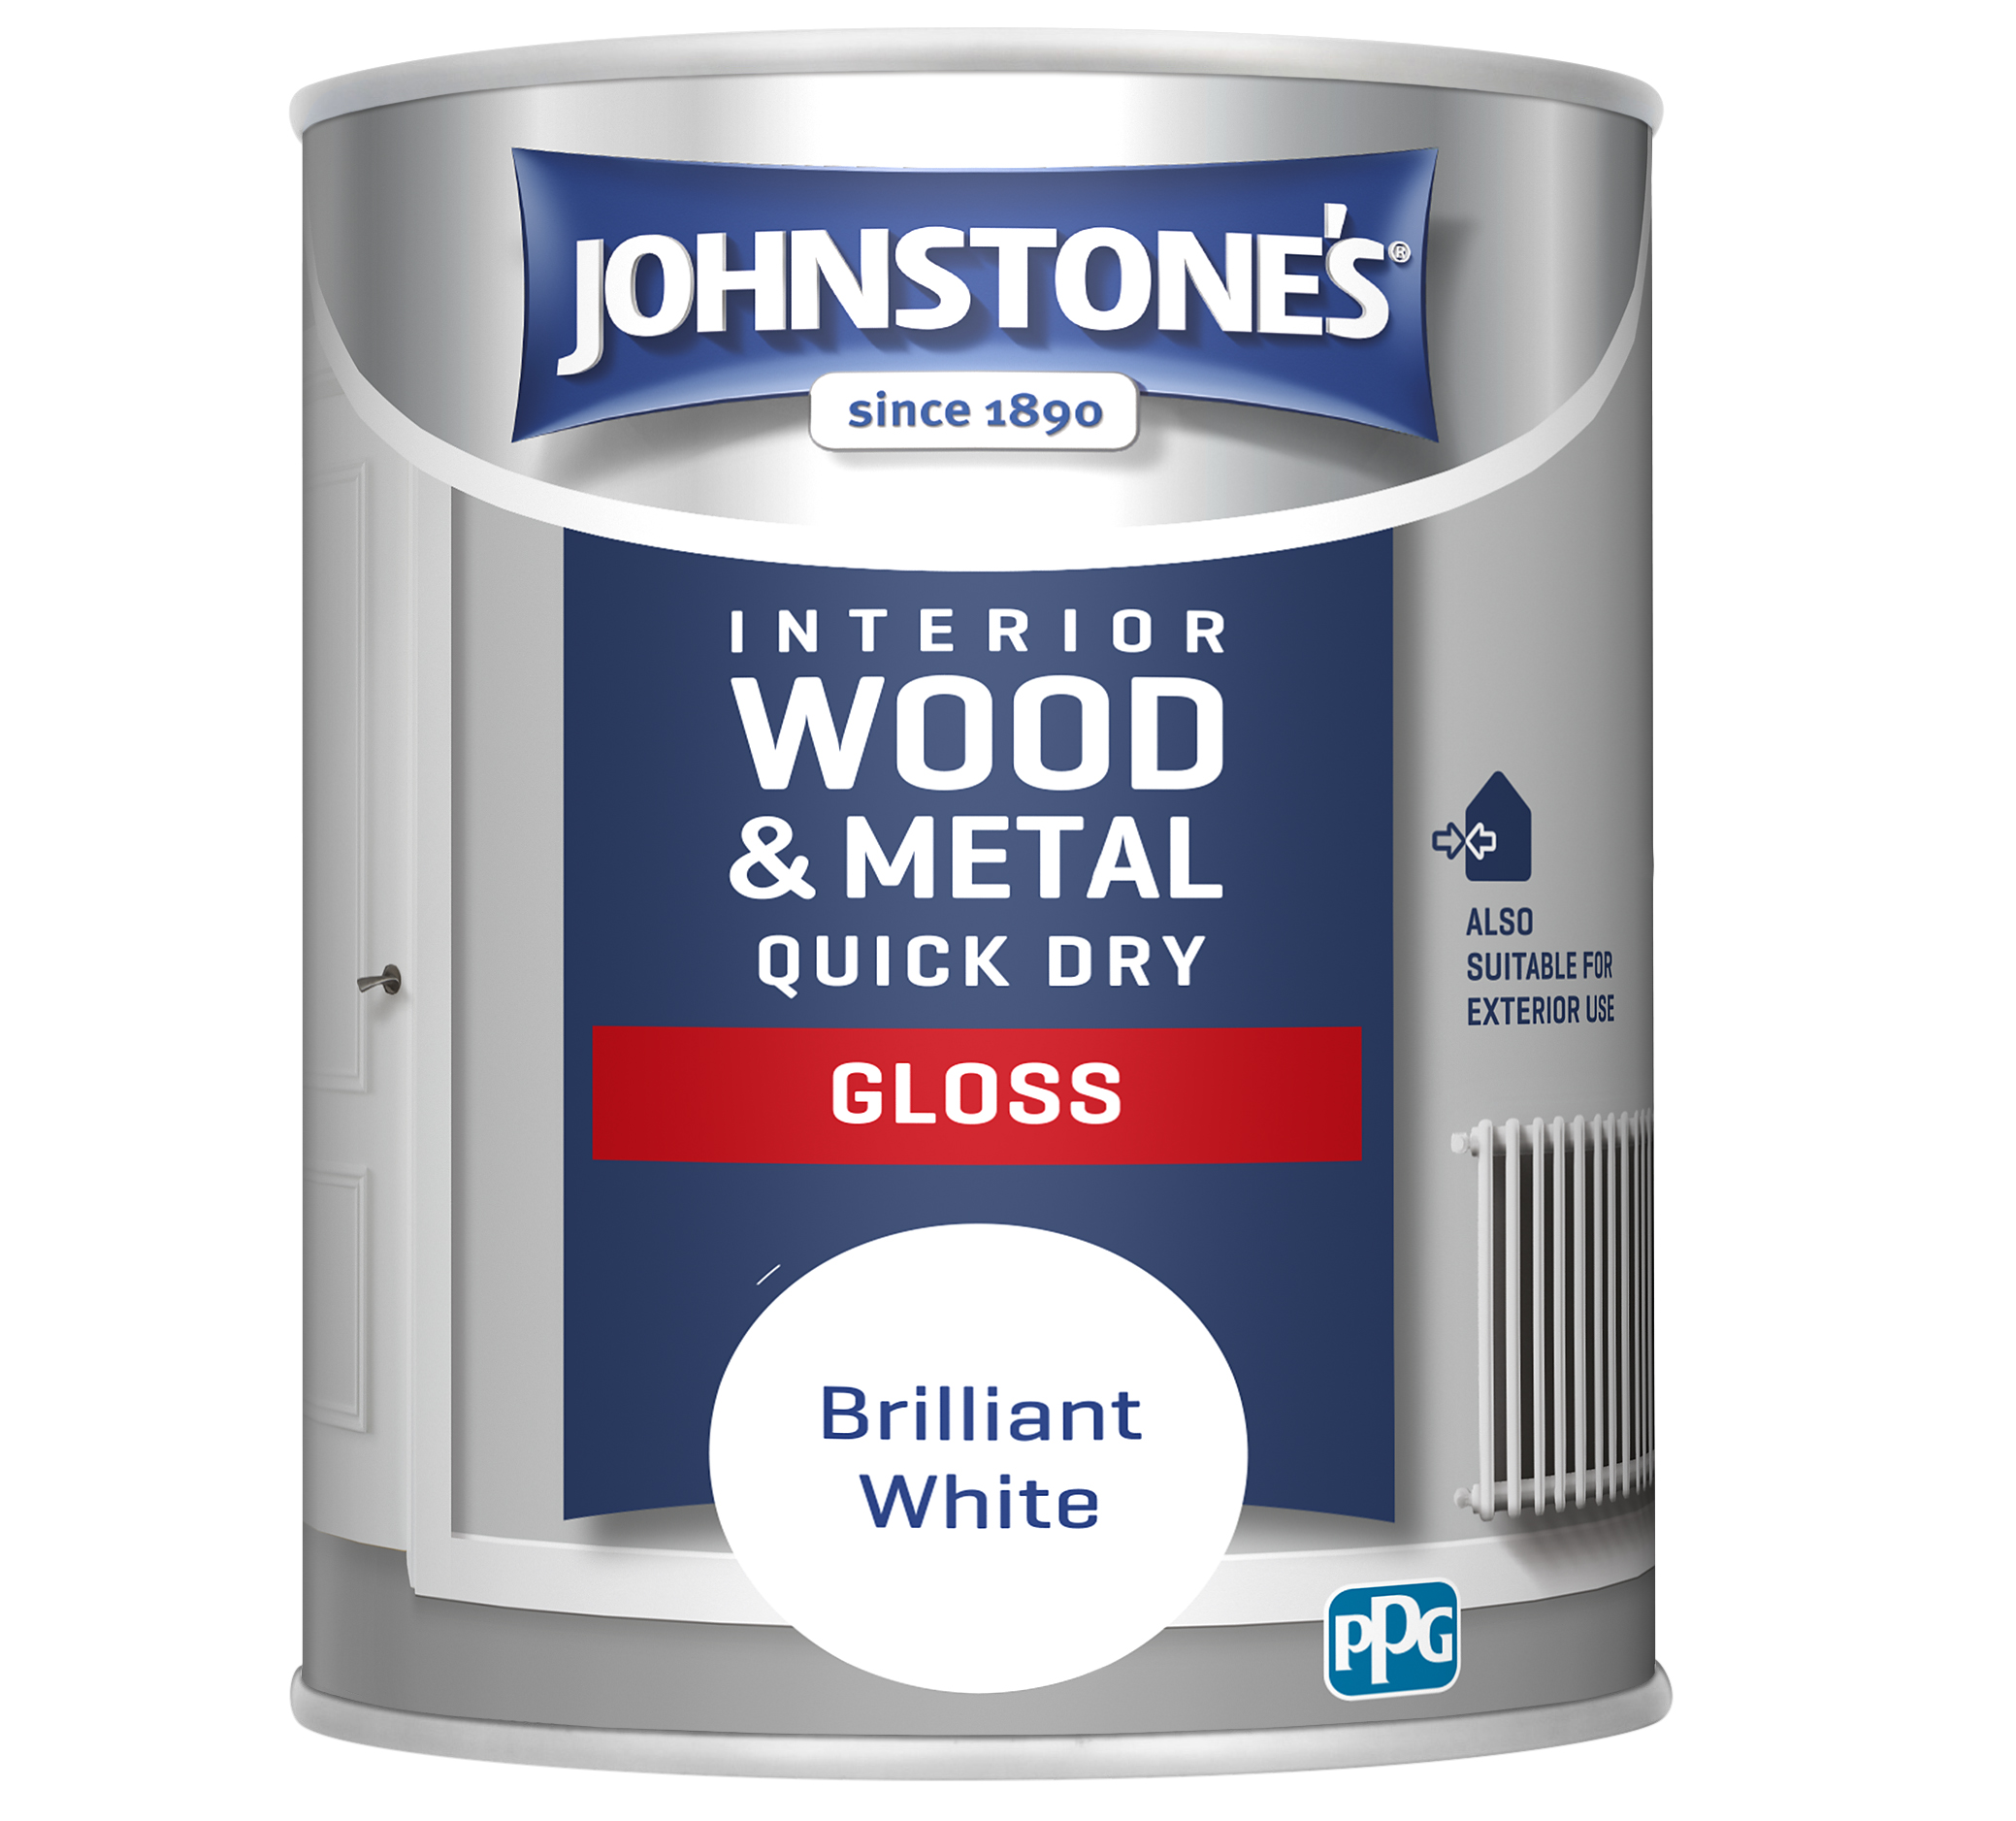 Johnstones 750ml Quick Dry Gloss Paint - Brilliant White